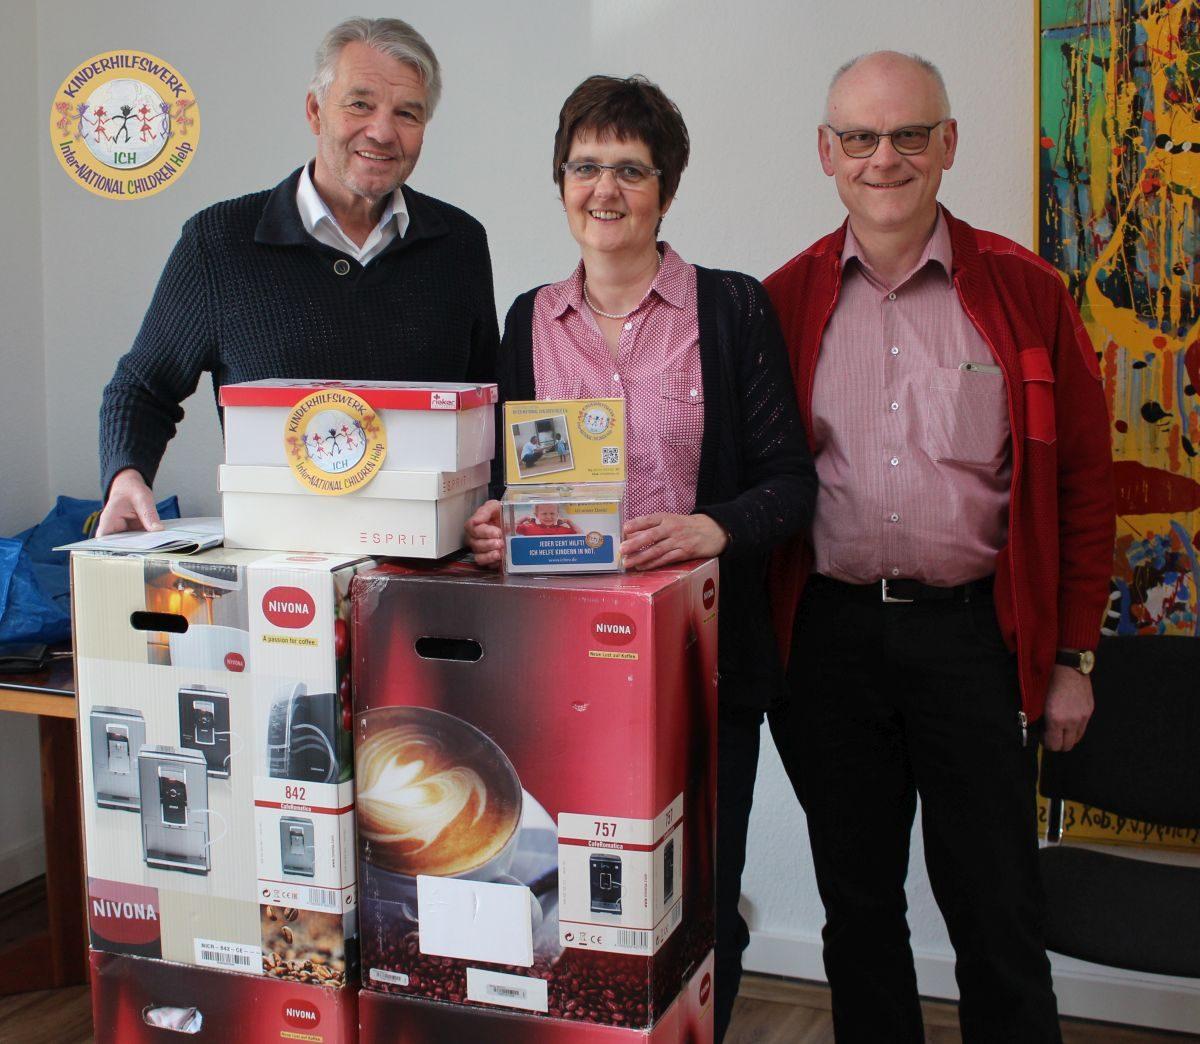 Elektronikfachhandel van Haren aus Bedburg-Hau/Huisberden hilft Kindern in Not